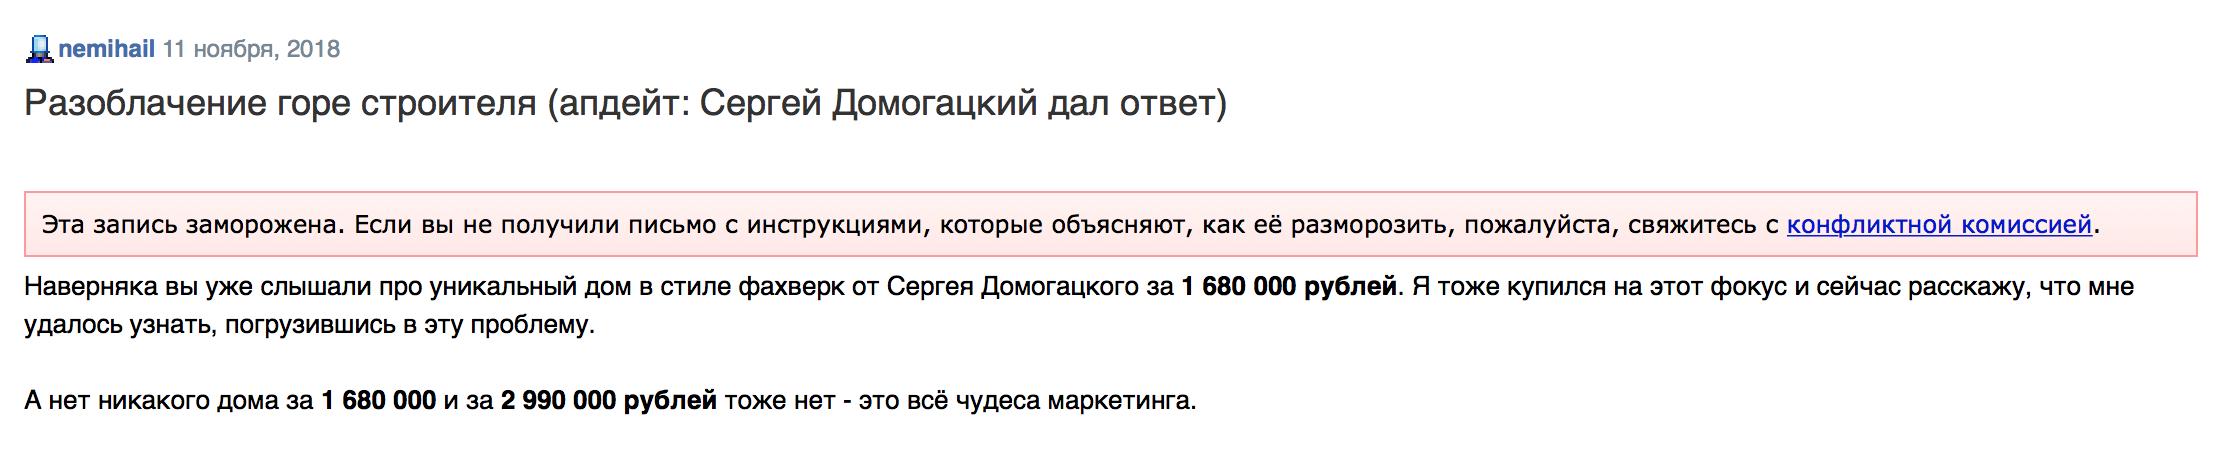 сергей домогацкий.jpg